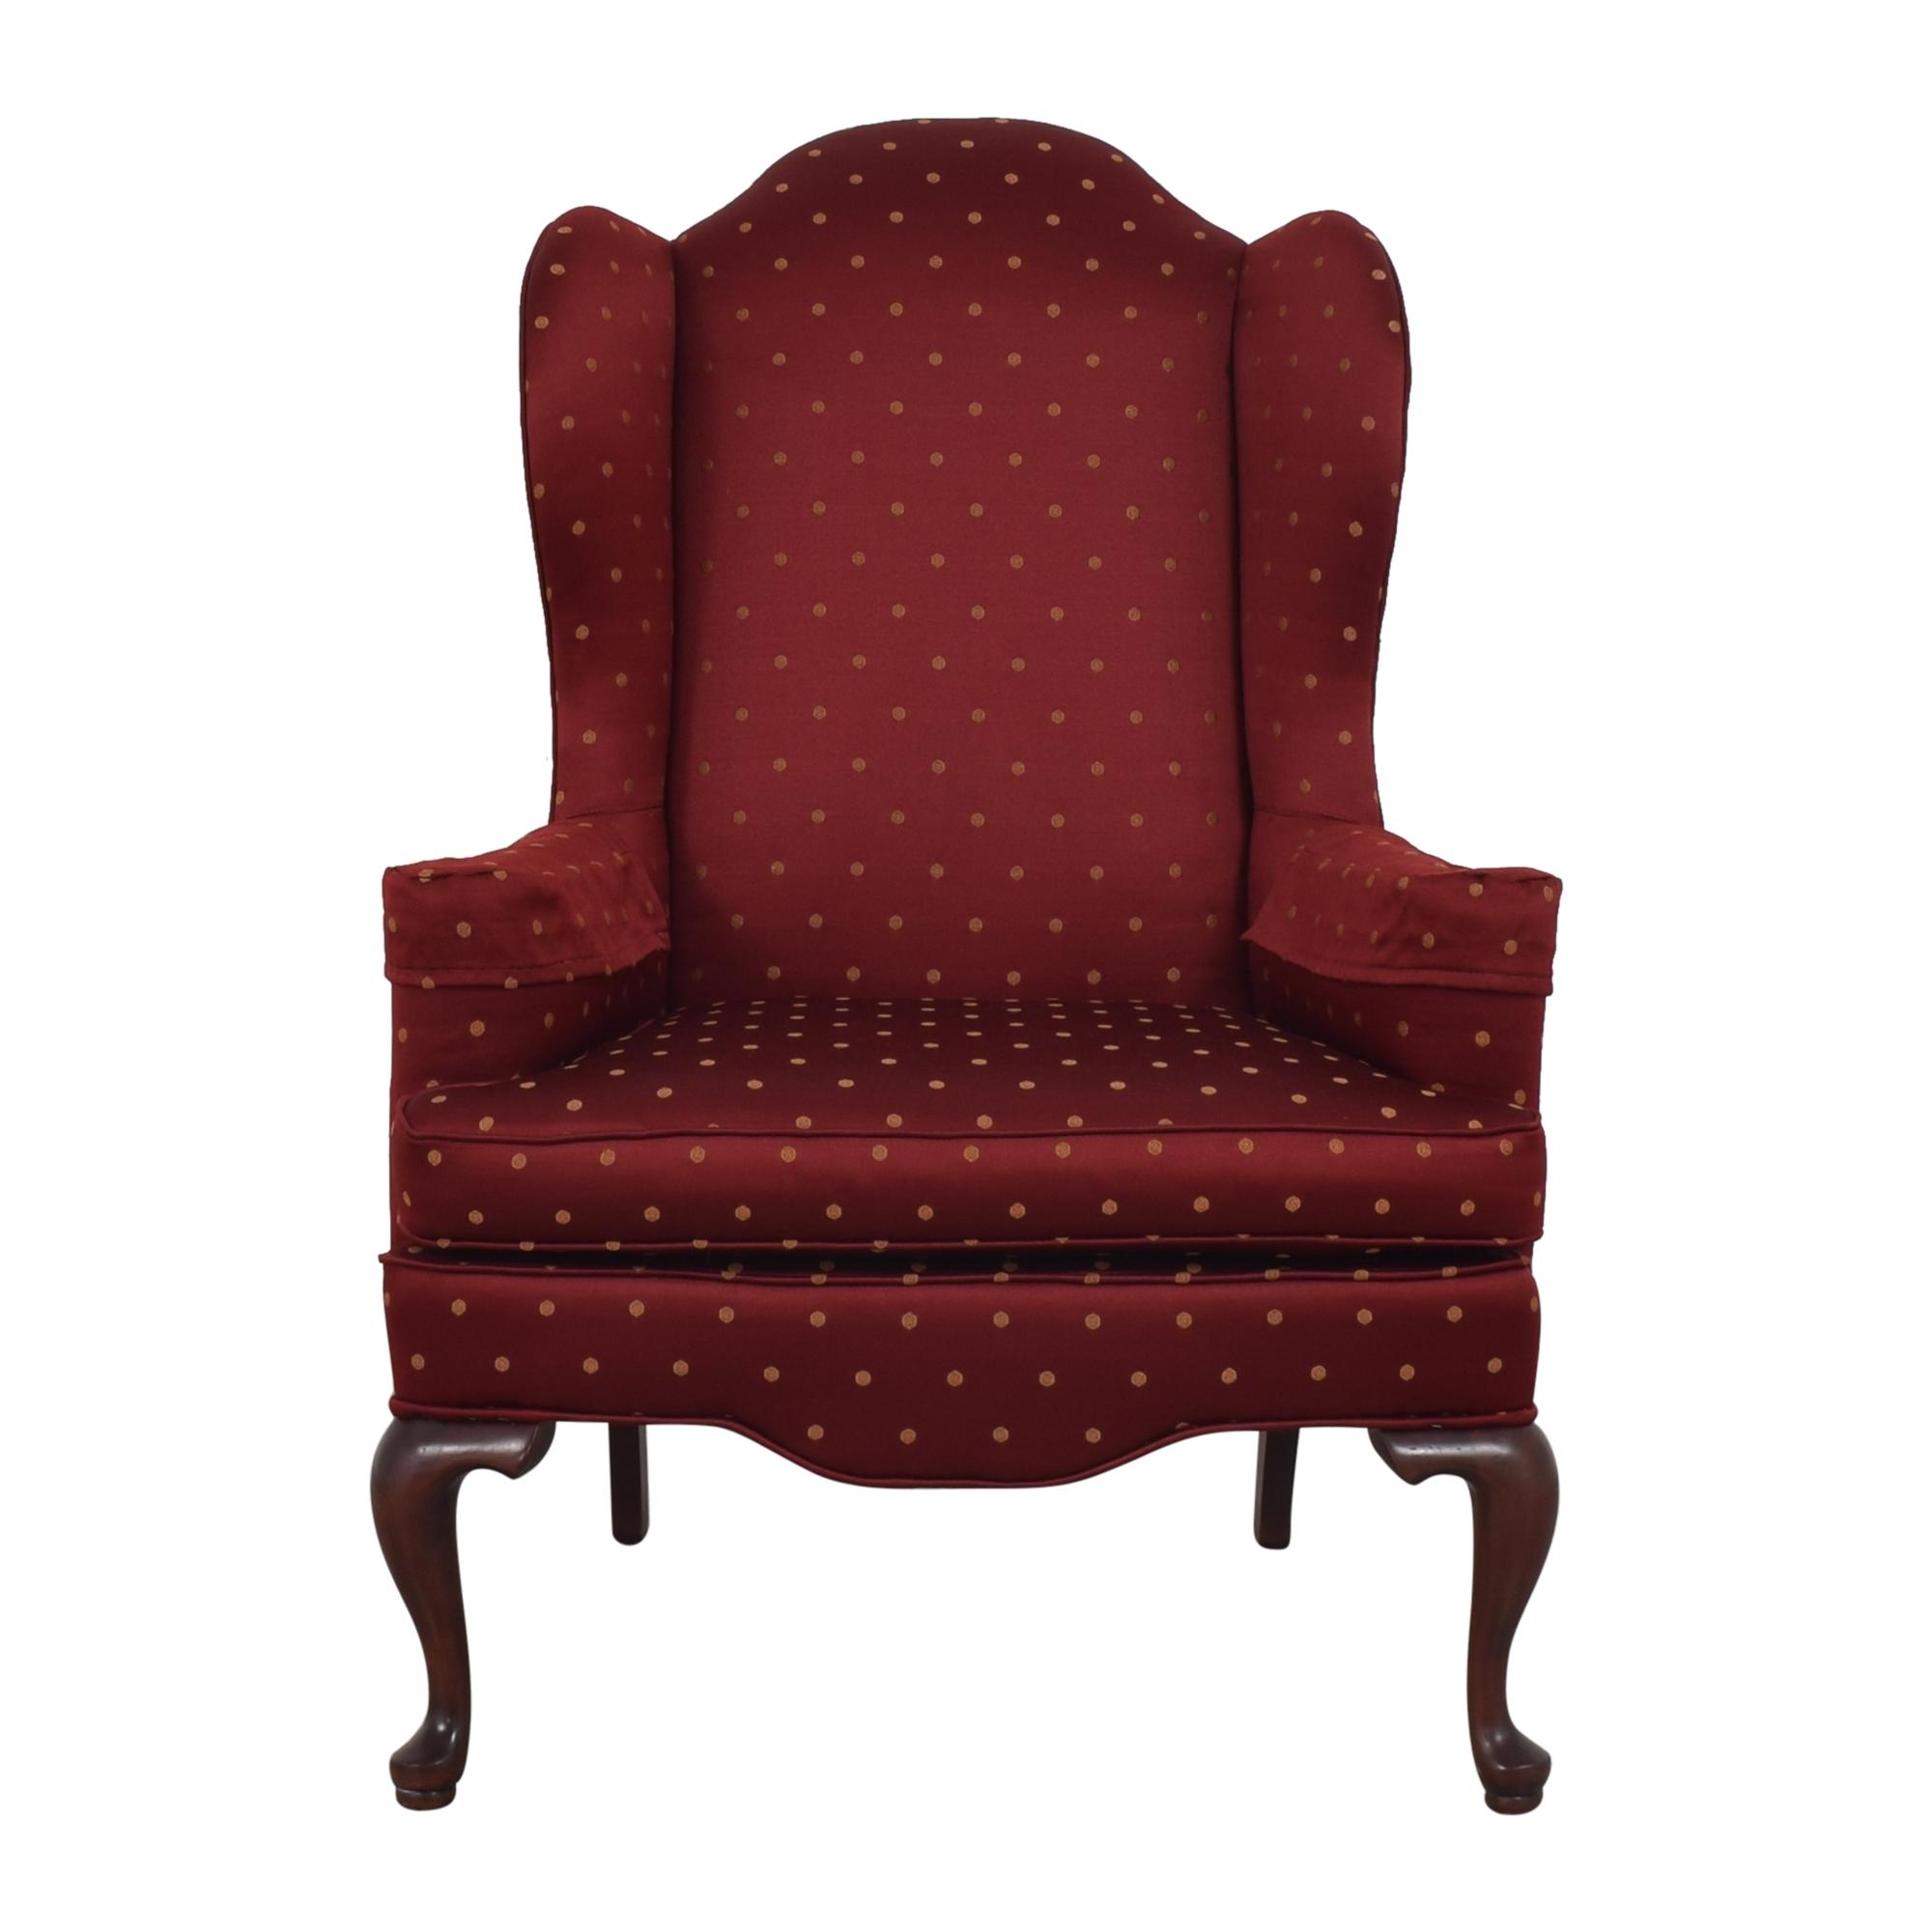 Ethan Allen Ethan Allen Wingback Arm Chair coupon